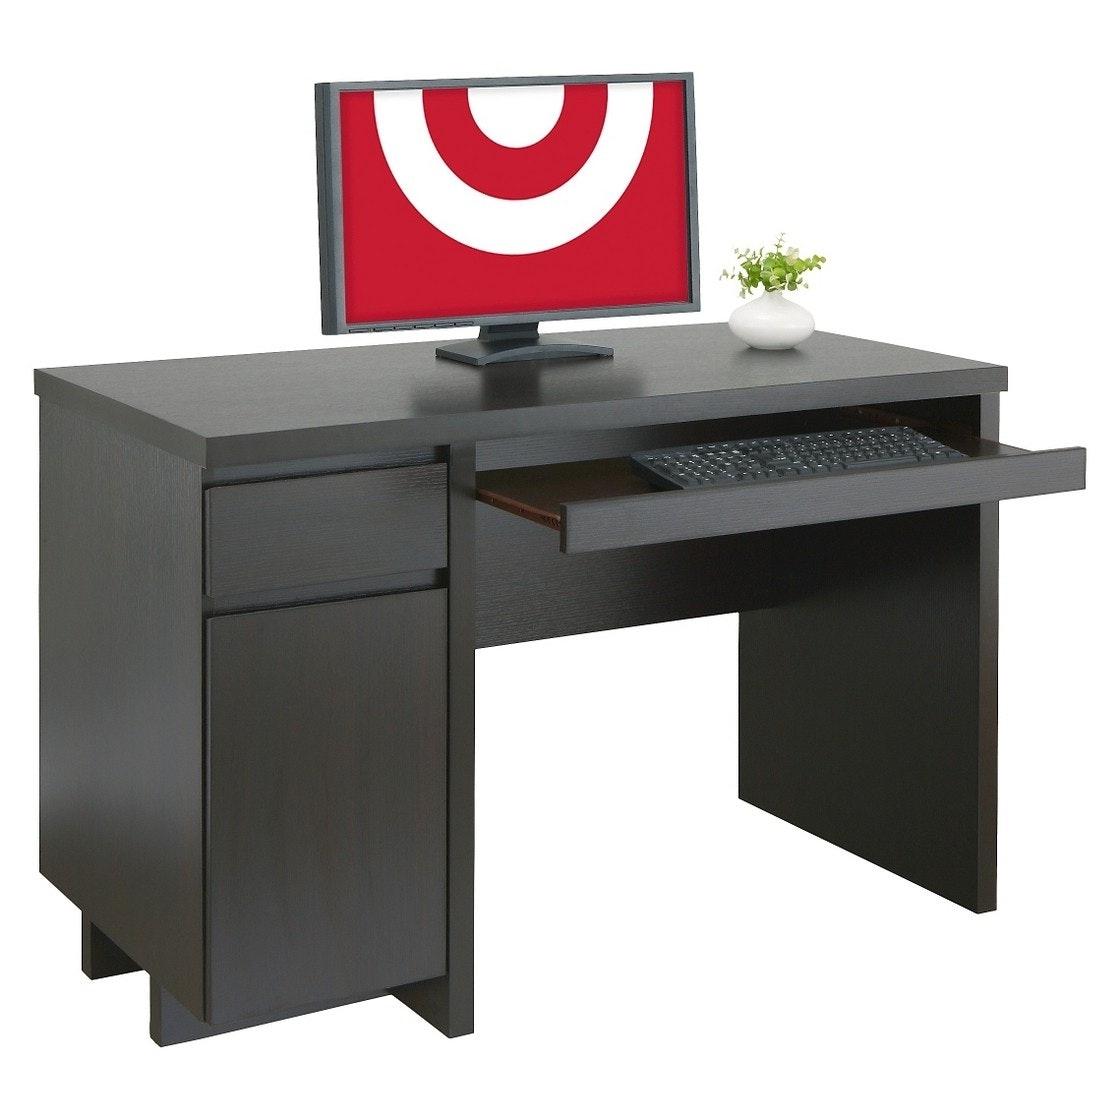 Most Popular Small Computer Desk Target The Best Desks Stories Foa Shocking Regarding Computer Desks Target (View 2 of 20)